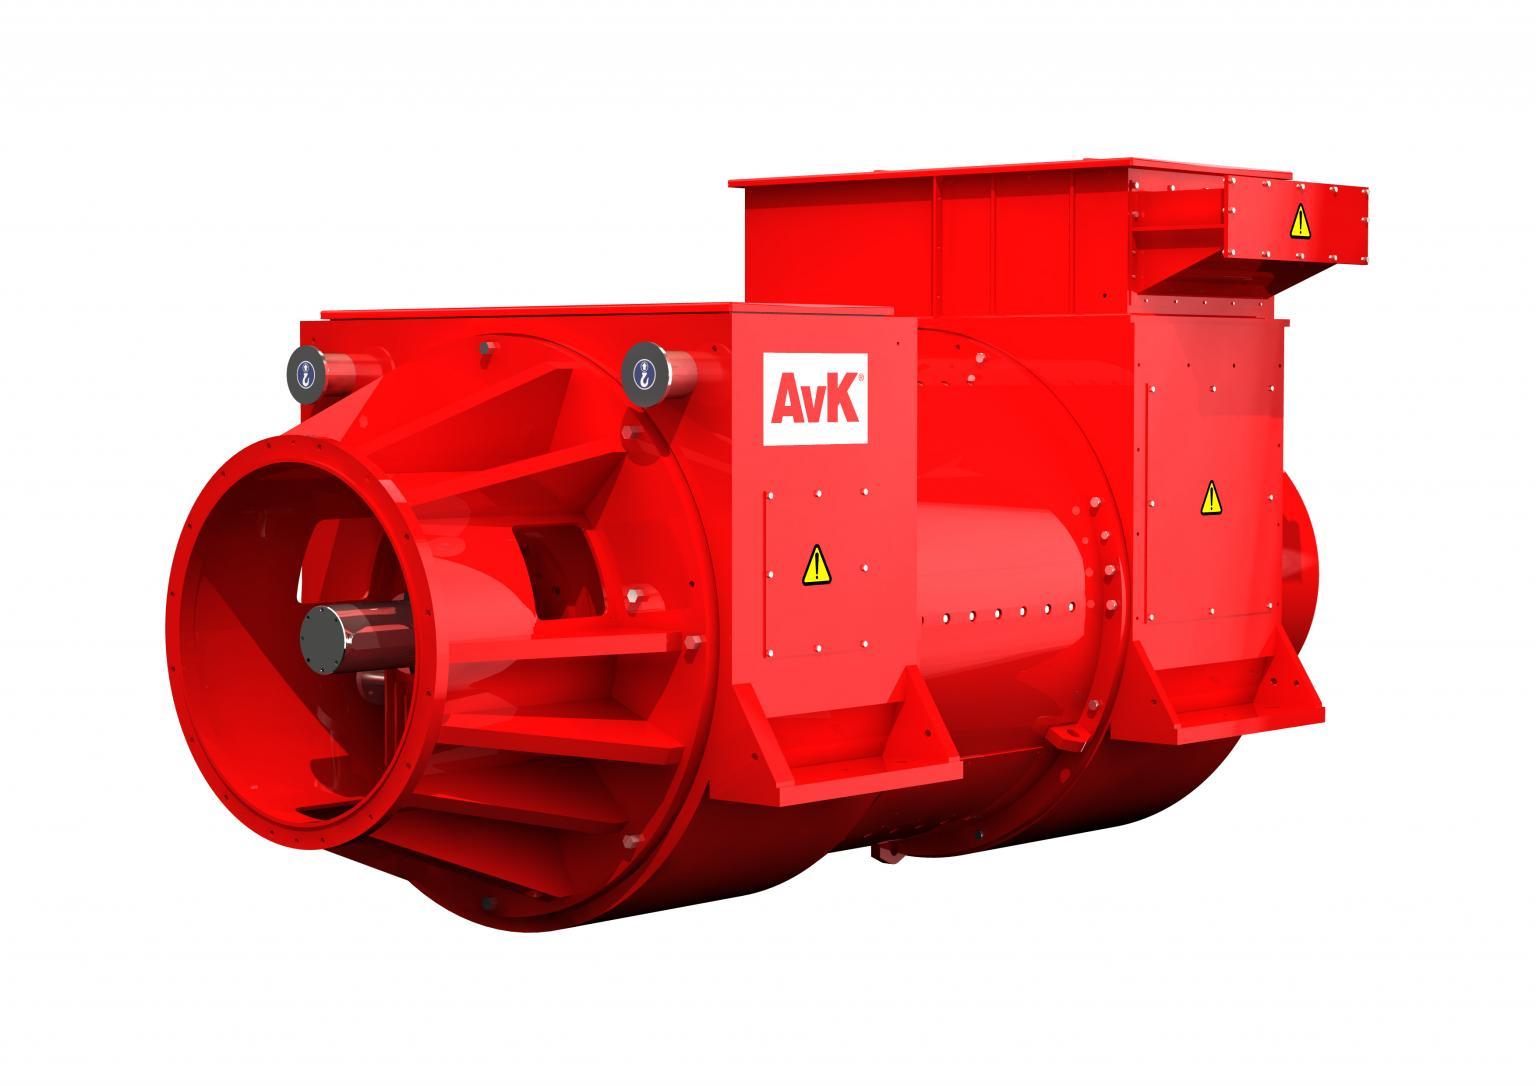 The DIG 140 generator